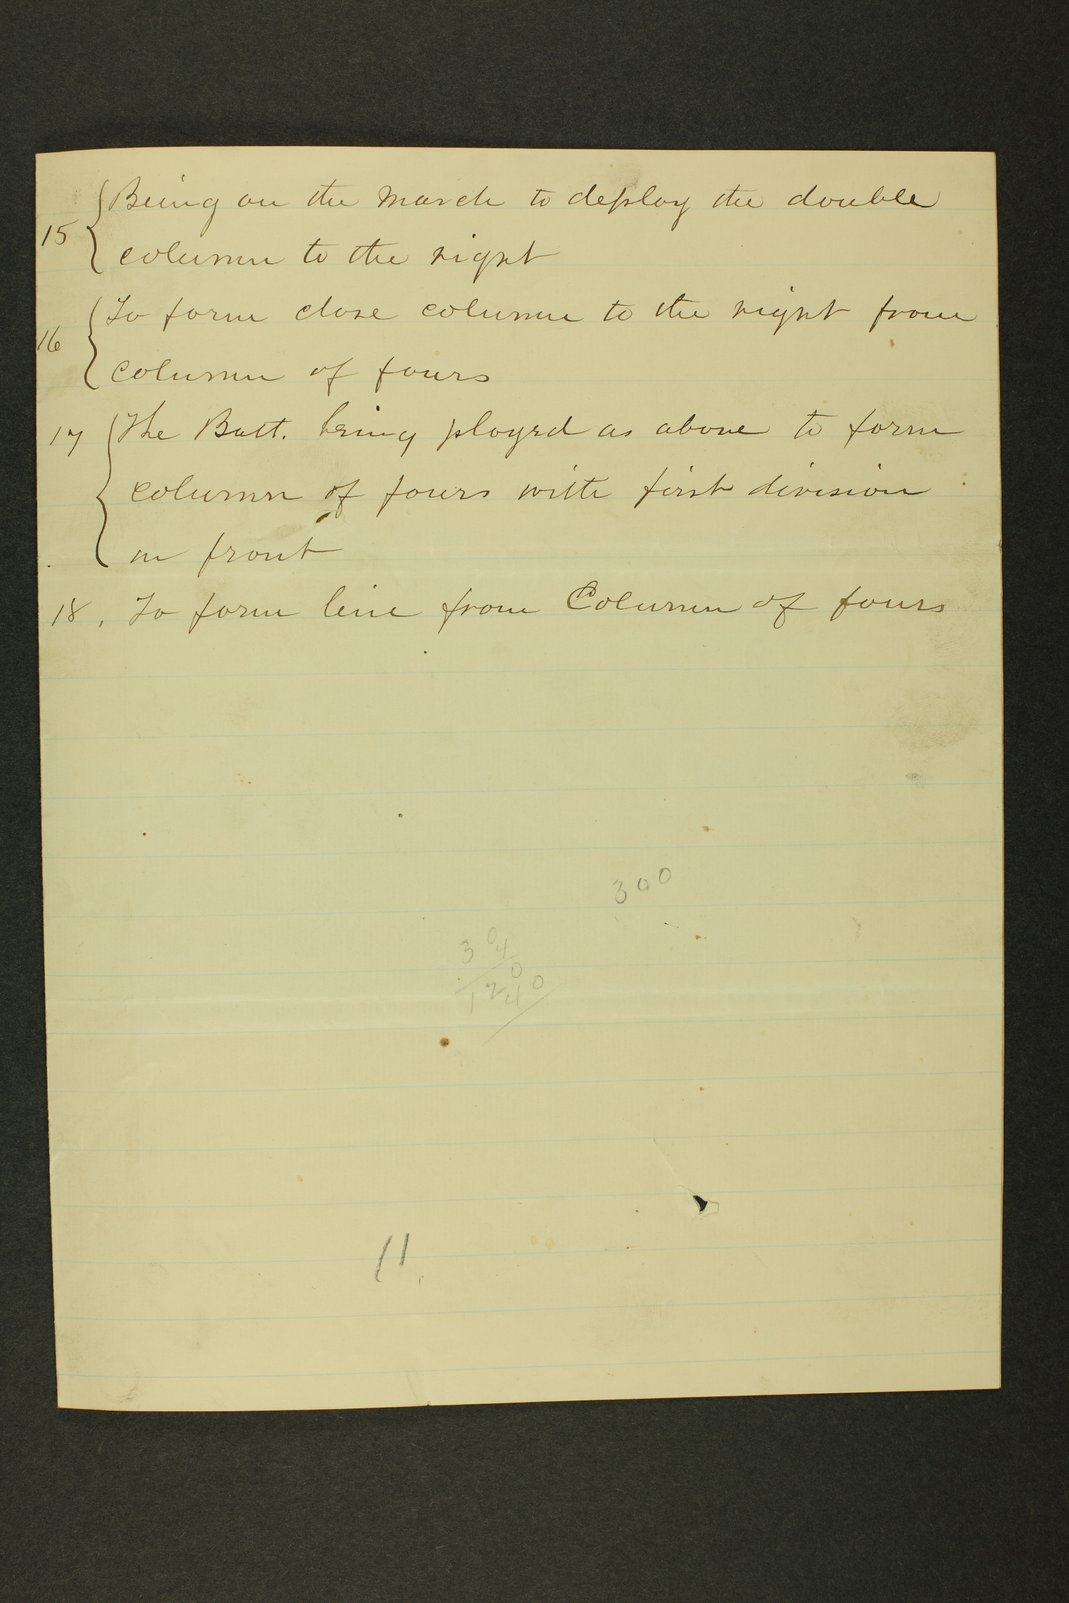 Kansas Adjutant General miscellaneous correpondence - 2